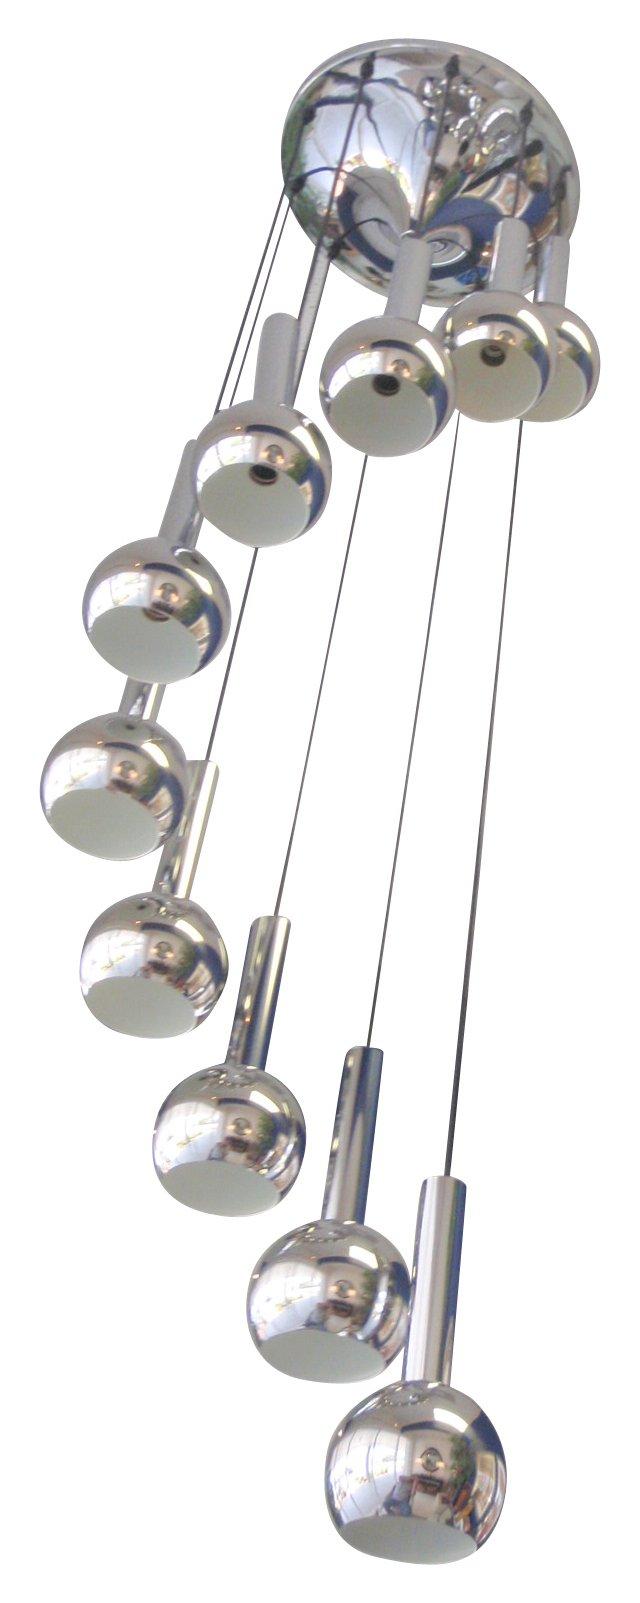 1970s Chrome Spiral Pendant Chandelier